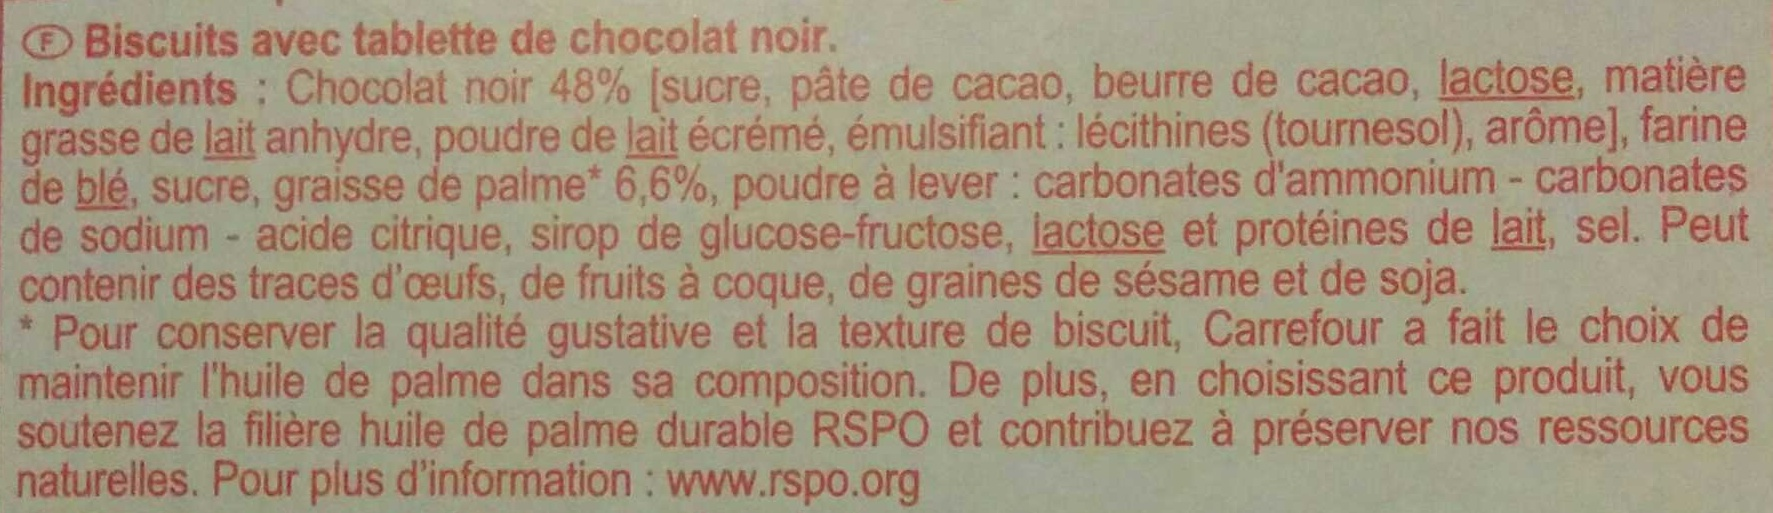 Biscuit tablette - Ingredientes - fr